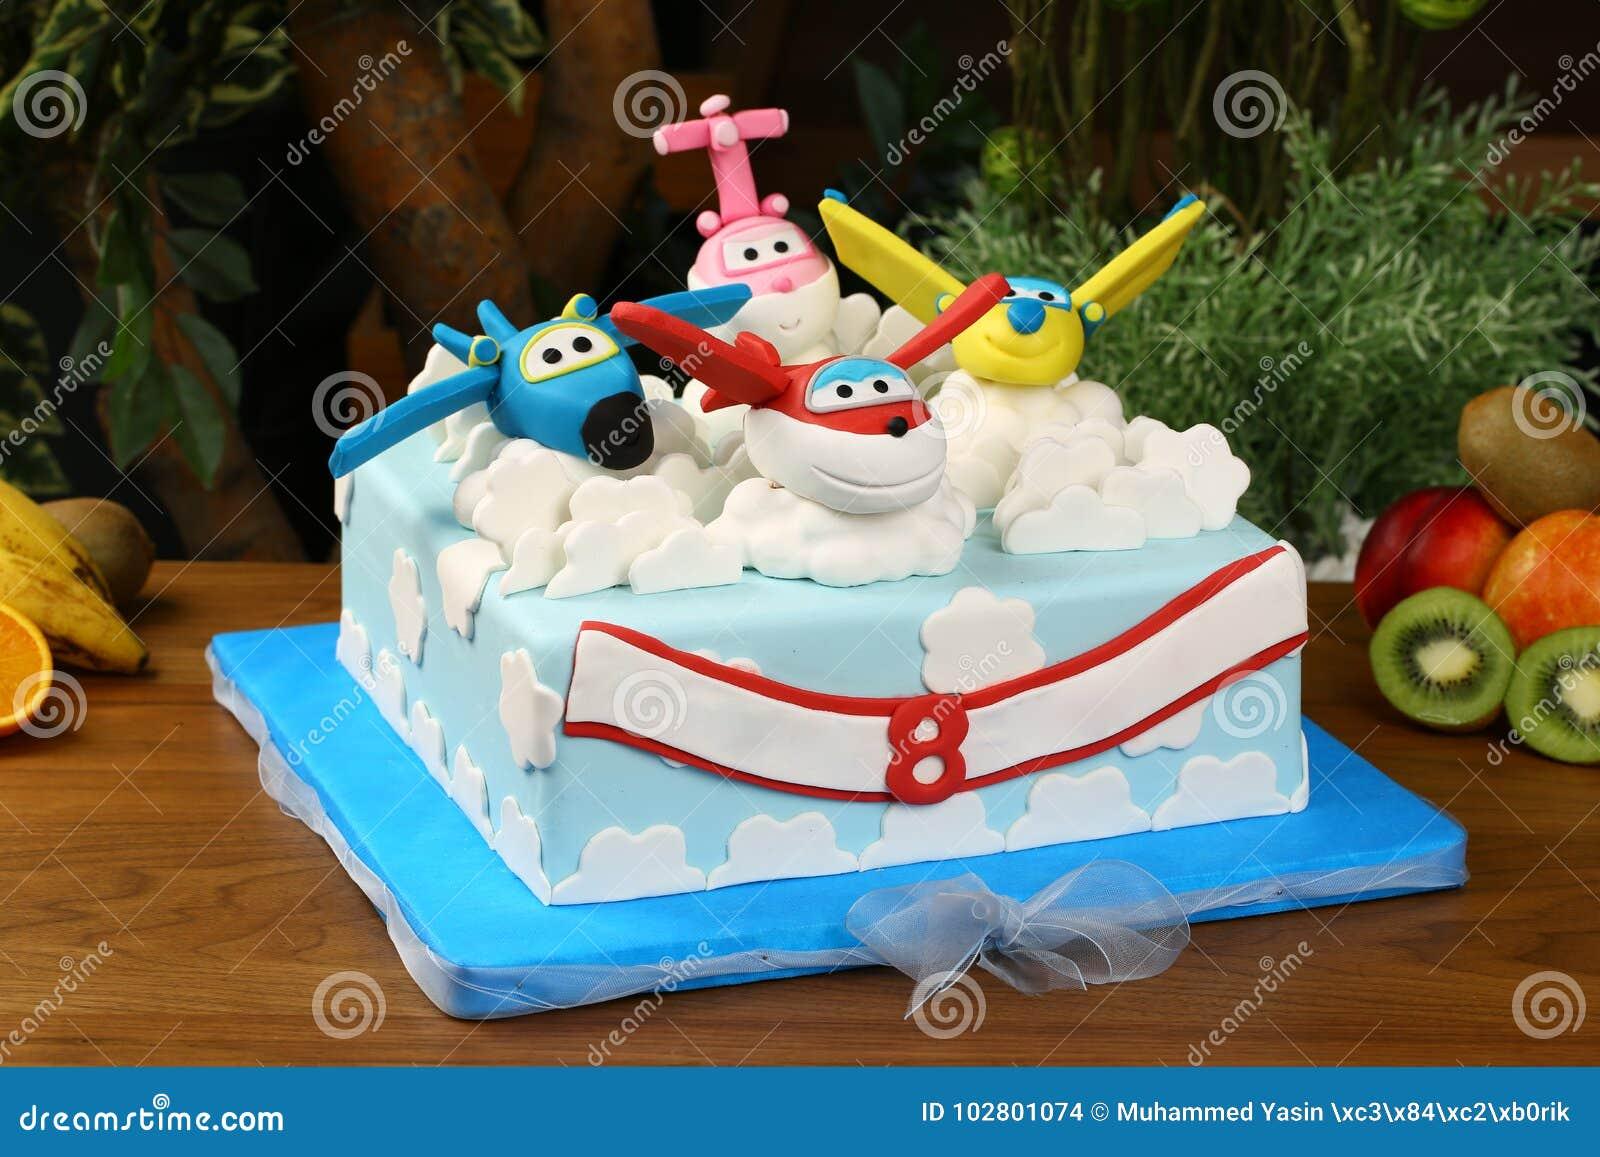 Kids Birthday Party Cake Airplane Consept Stock Photo Image Of